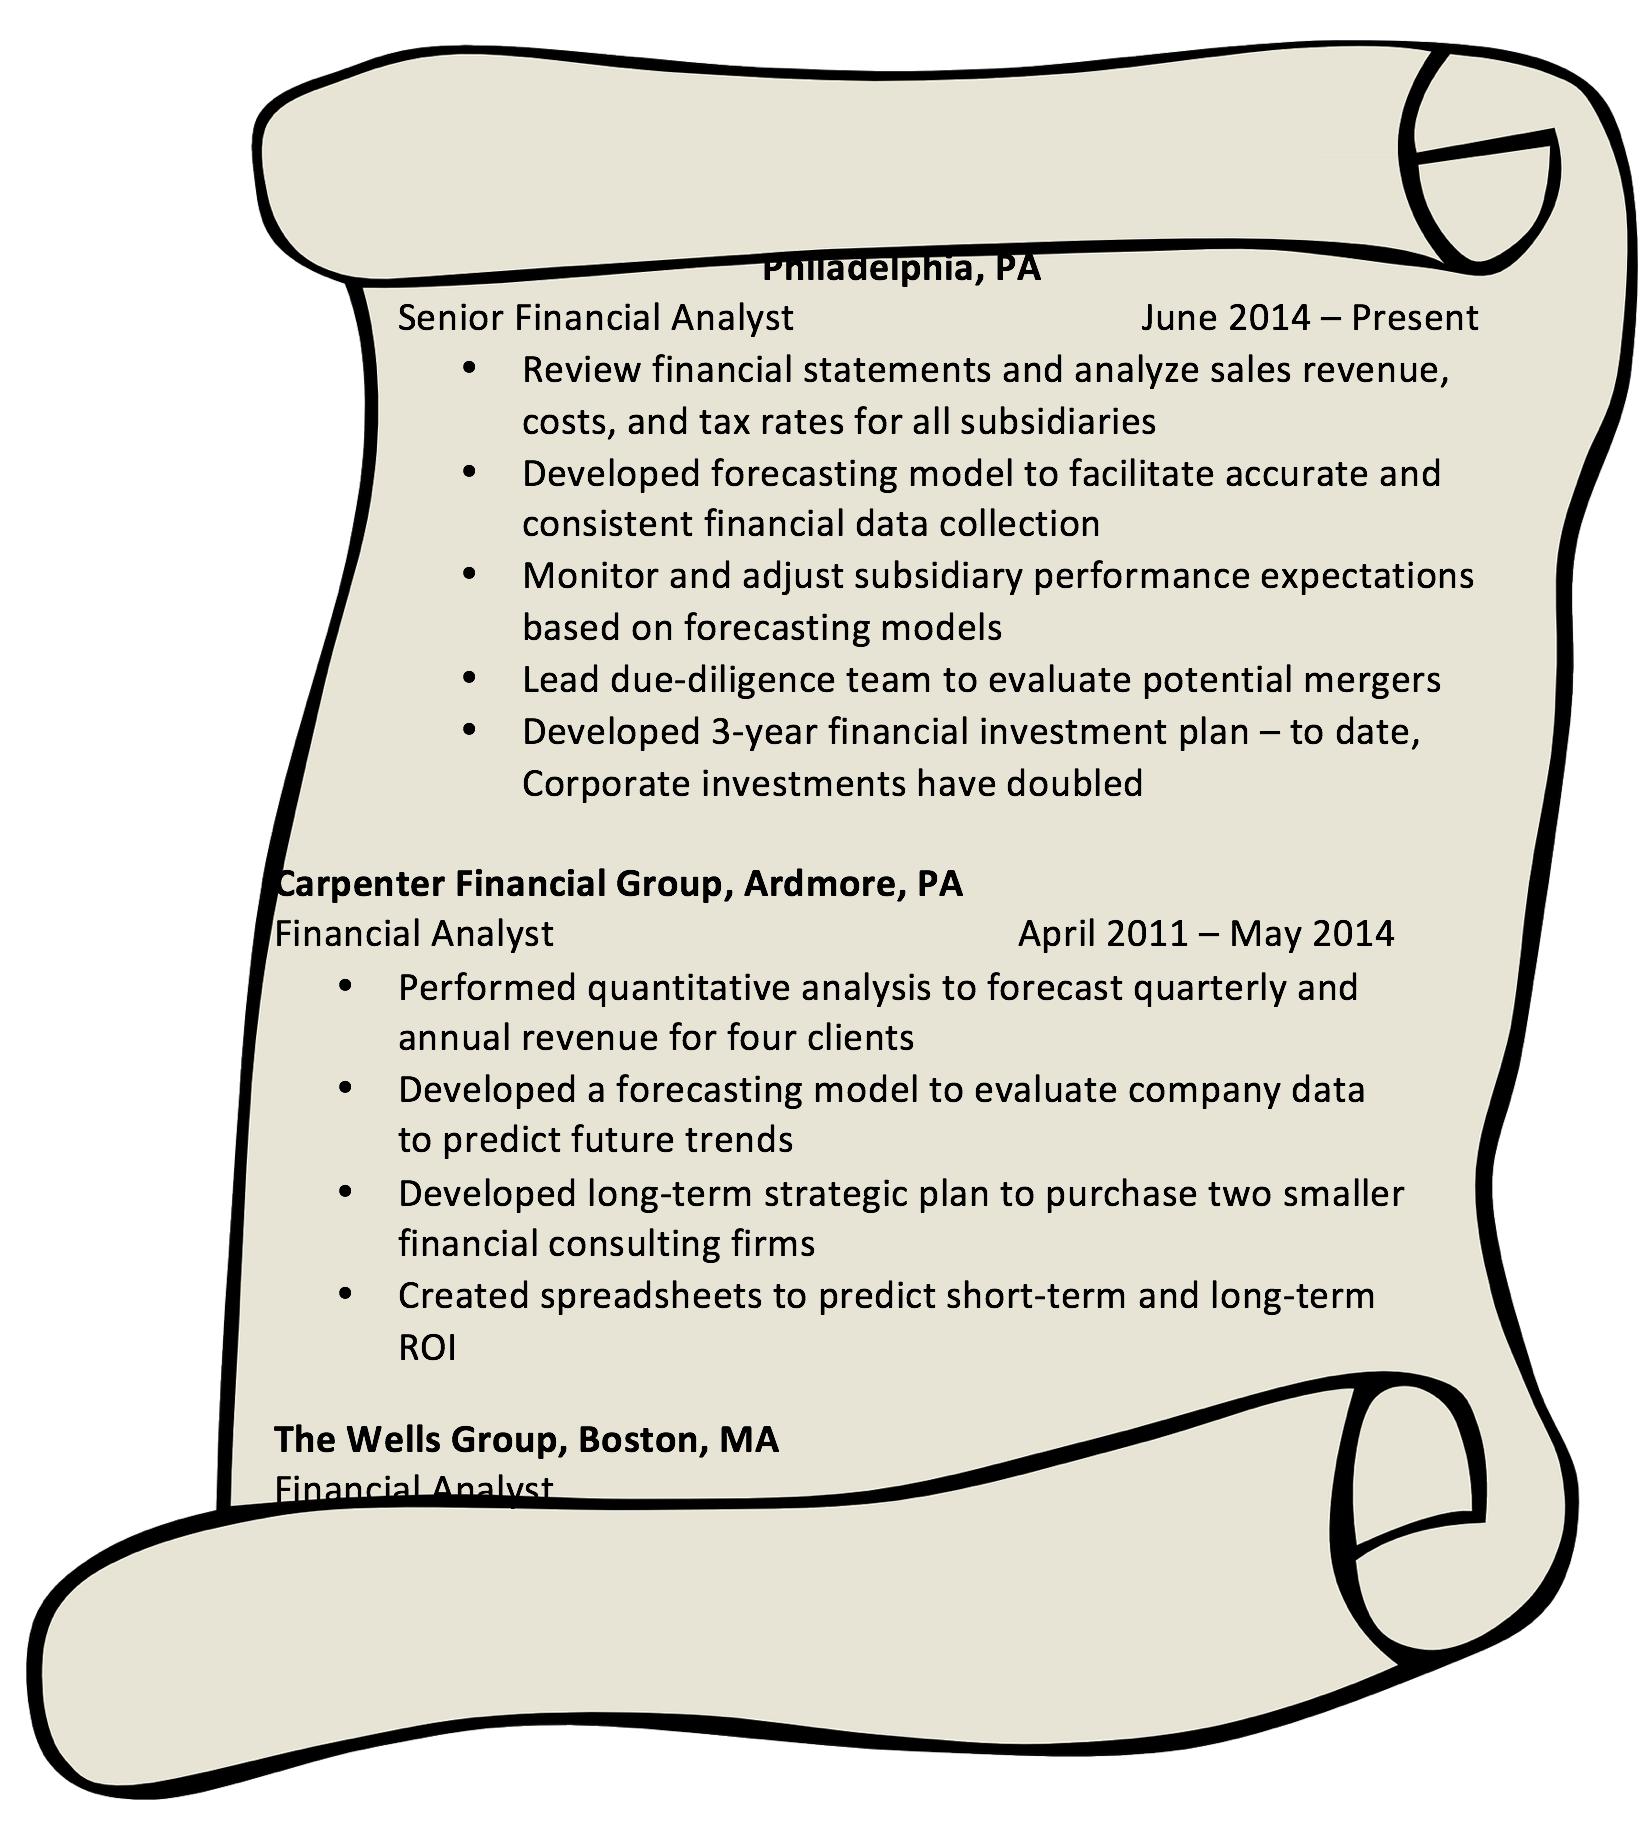 master resume drexel goodwin